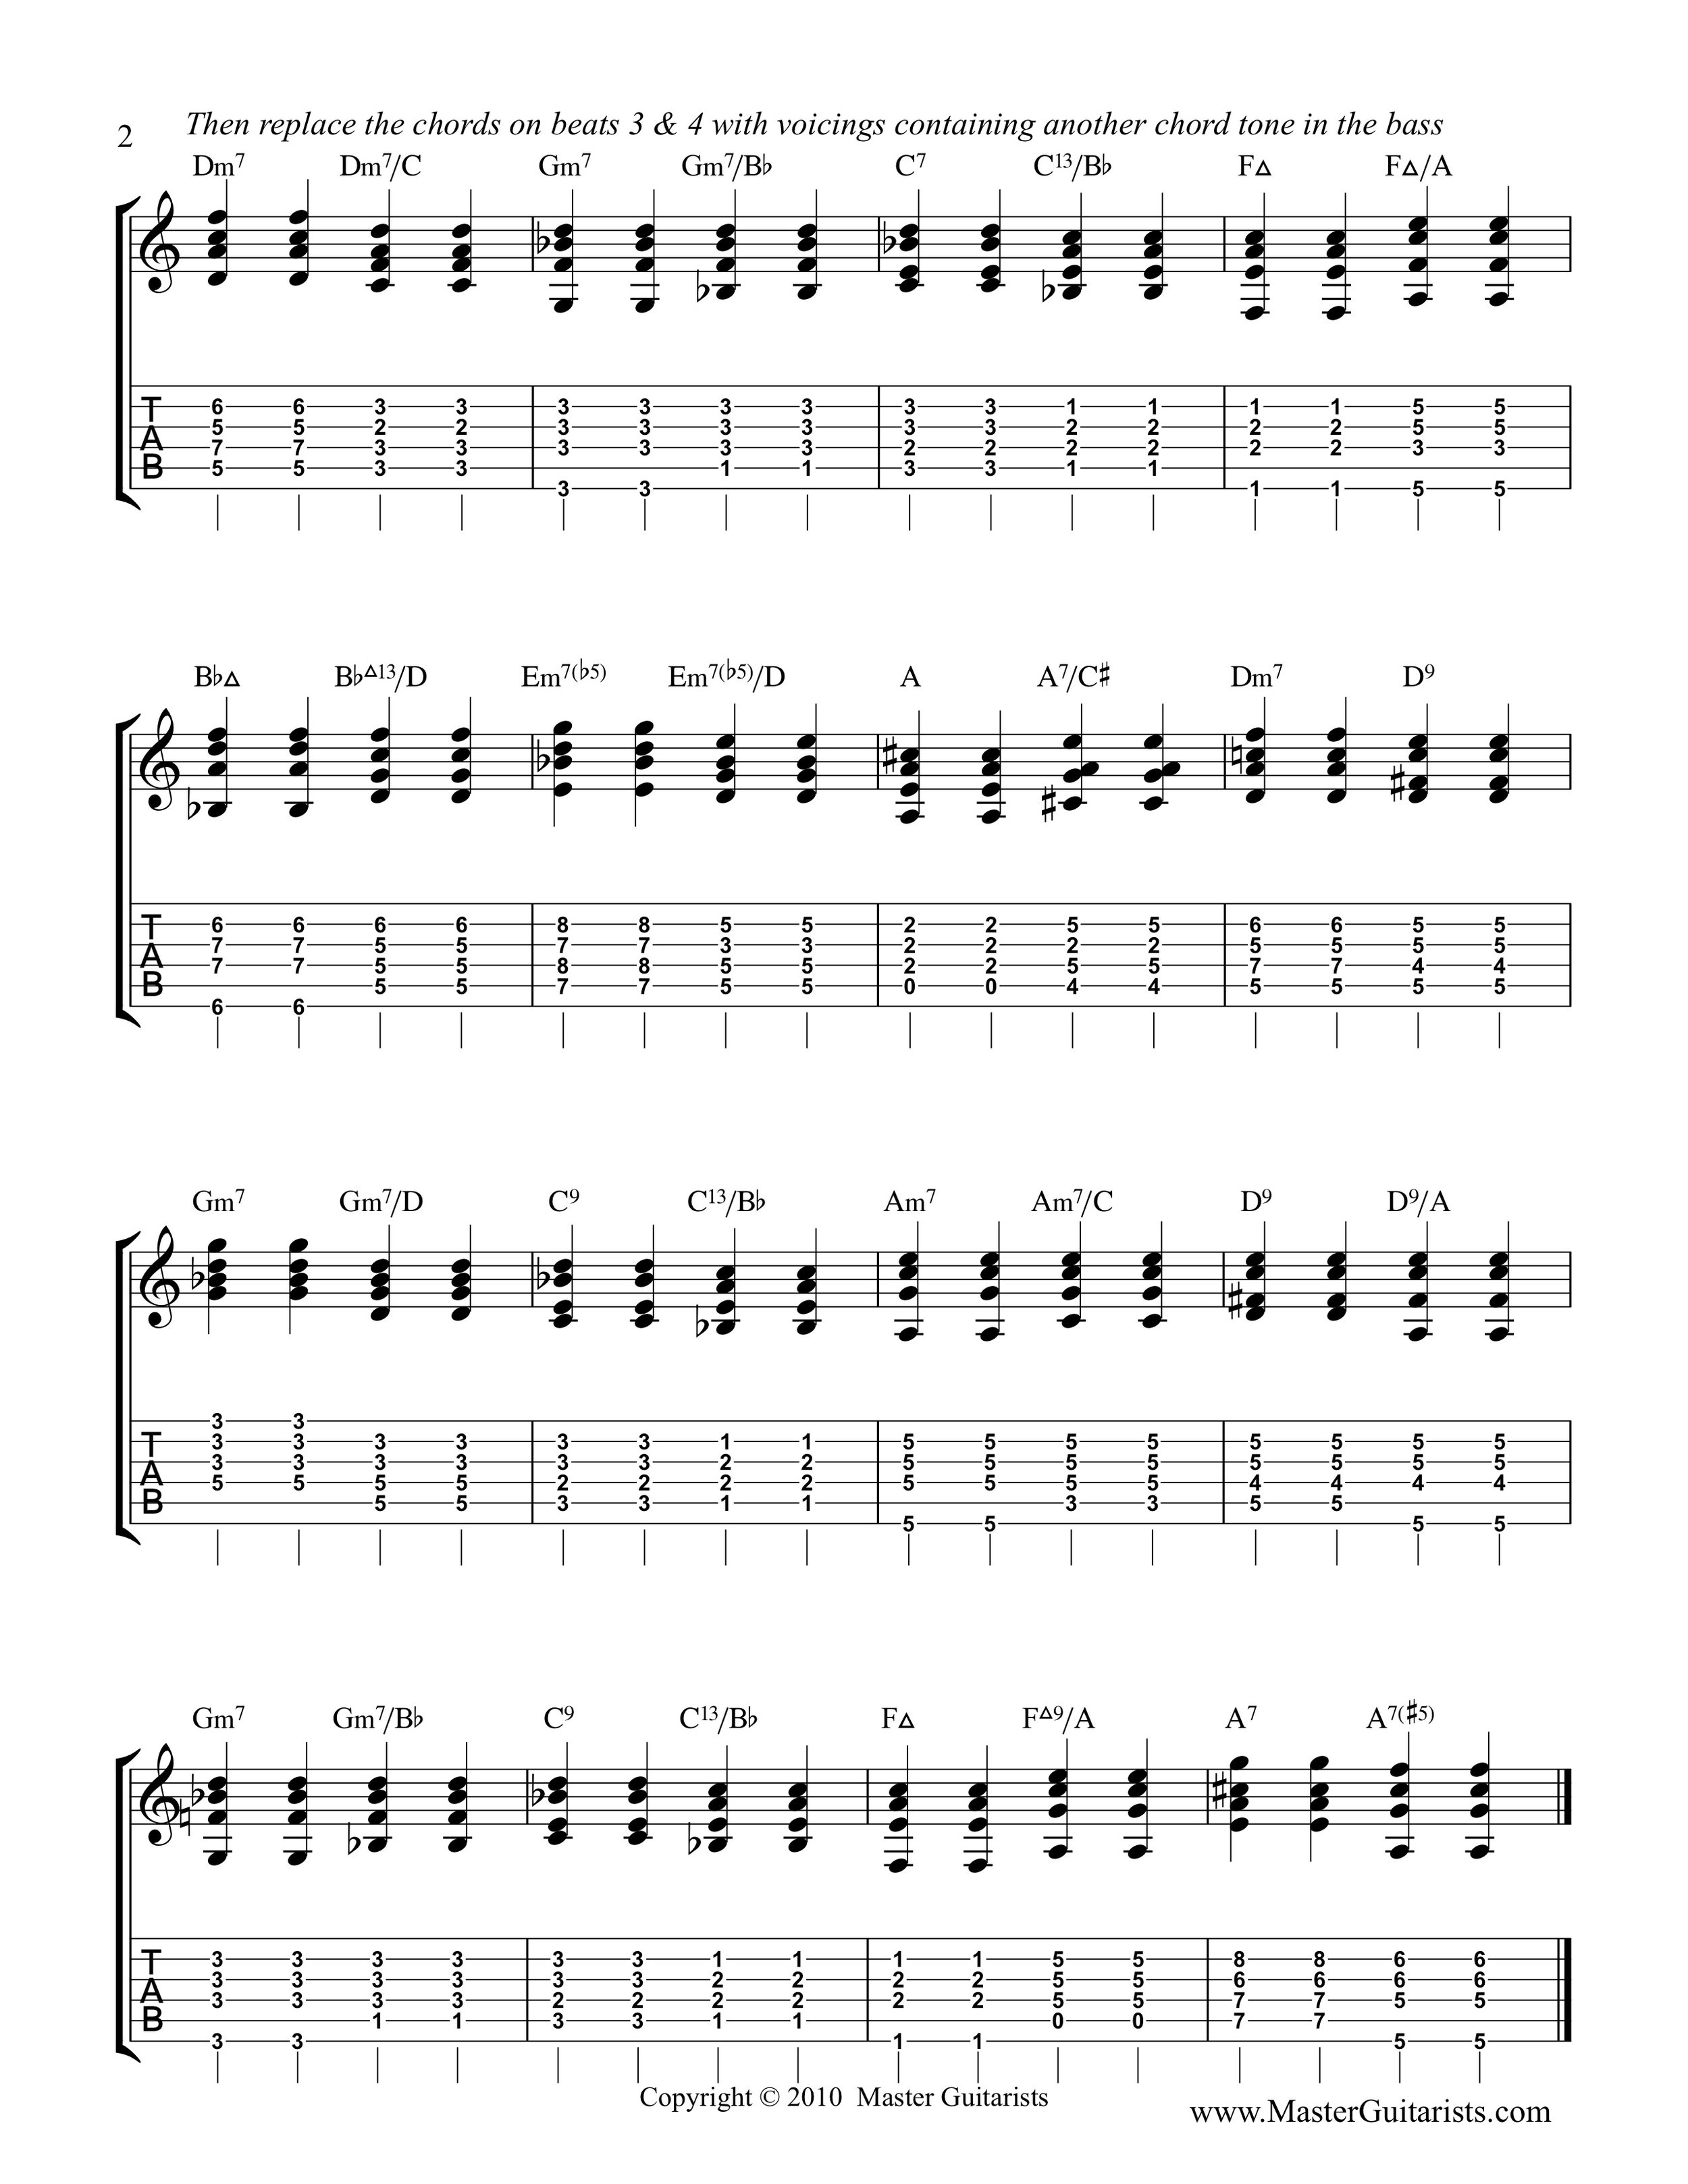 How To Play Walking Bass Part 21425651234 6-2.jpeg